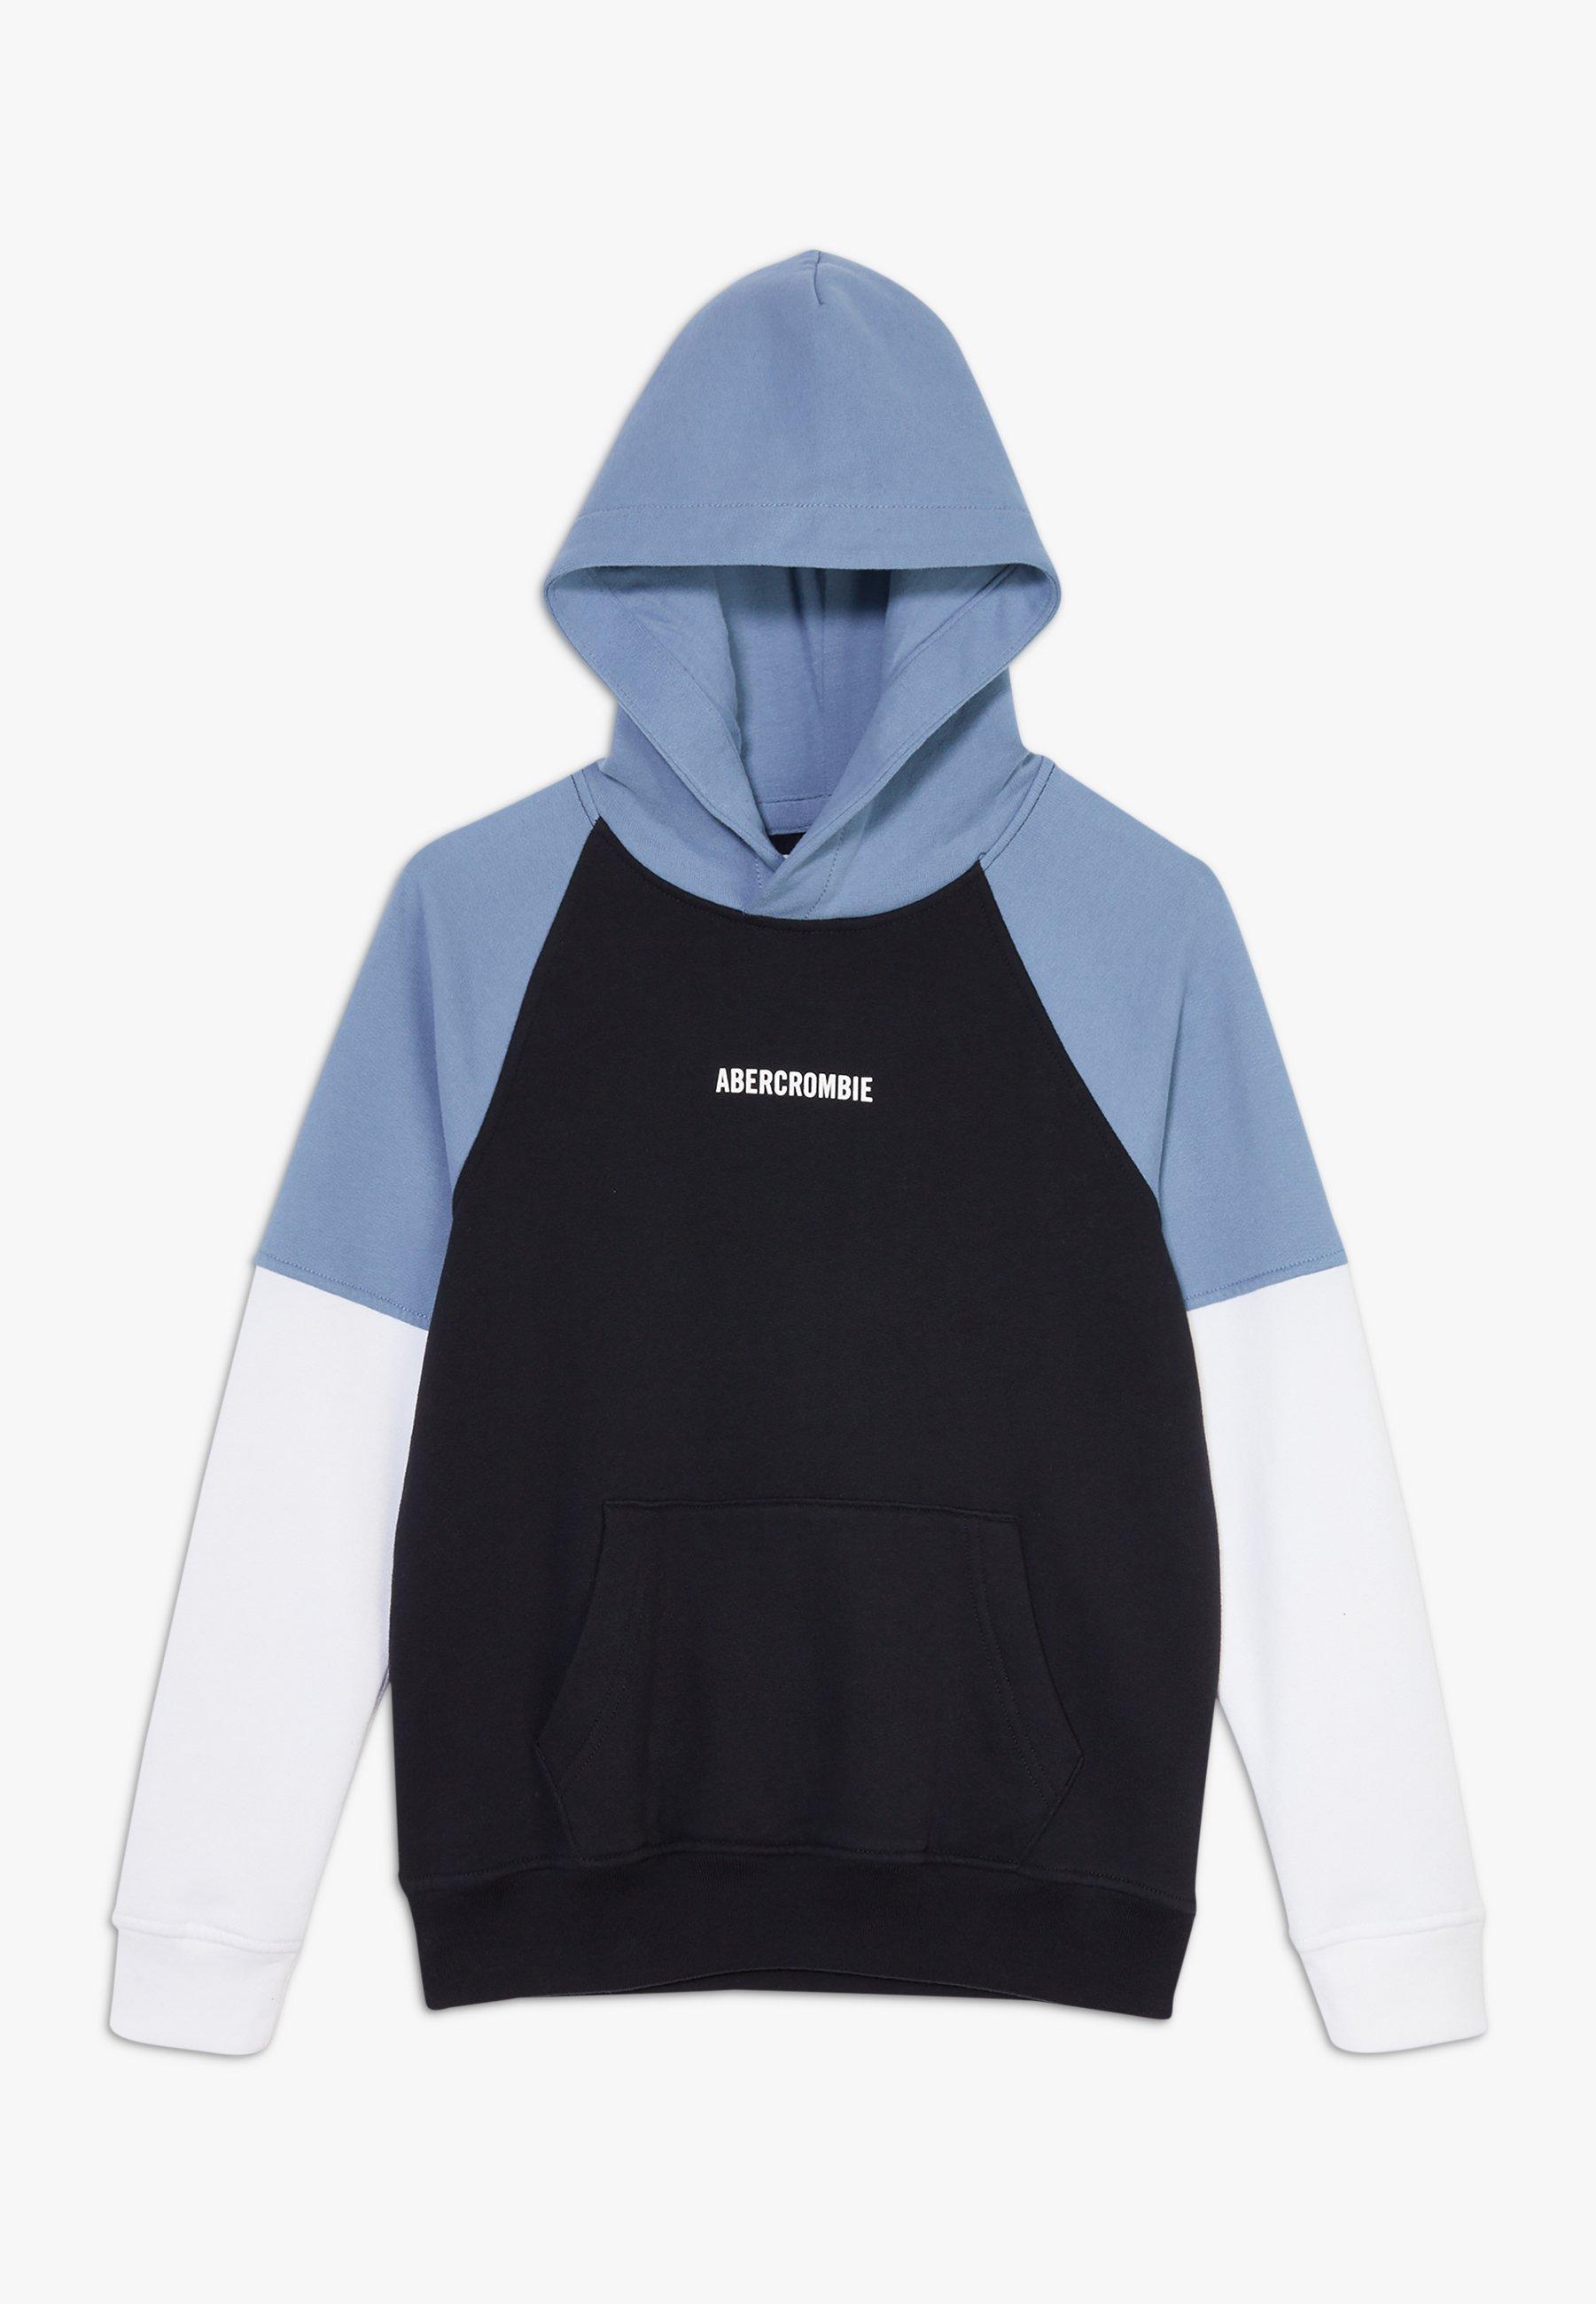 Große Förderung Abercrombie & Fitch JAN2 T2 COLORBLOCK - Sweatshirt - navy blue | Damenbekleidung 2020